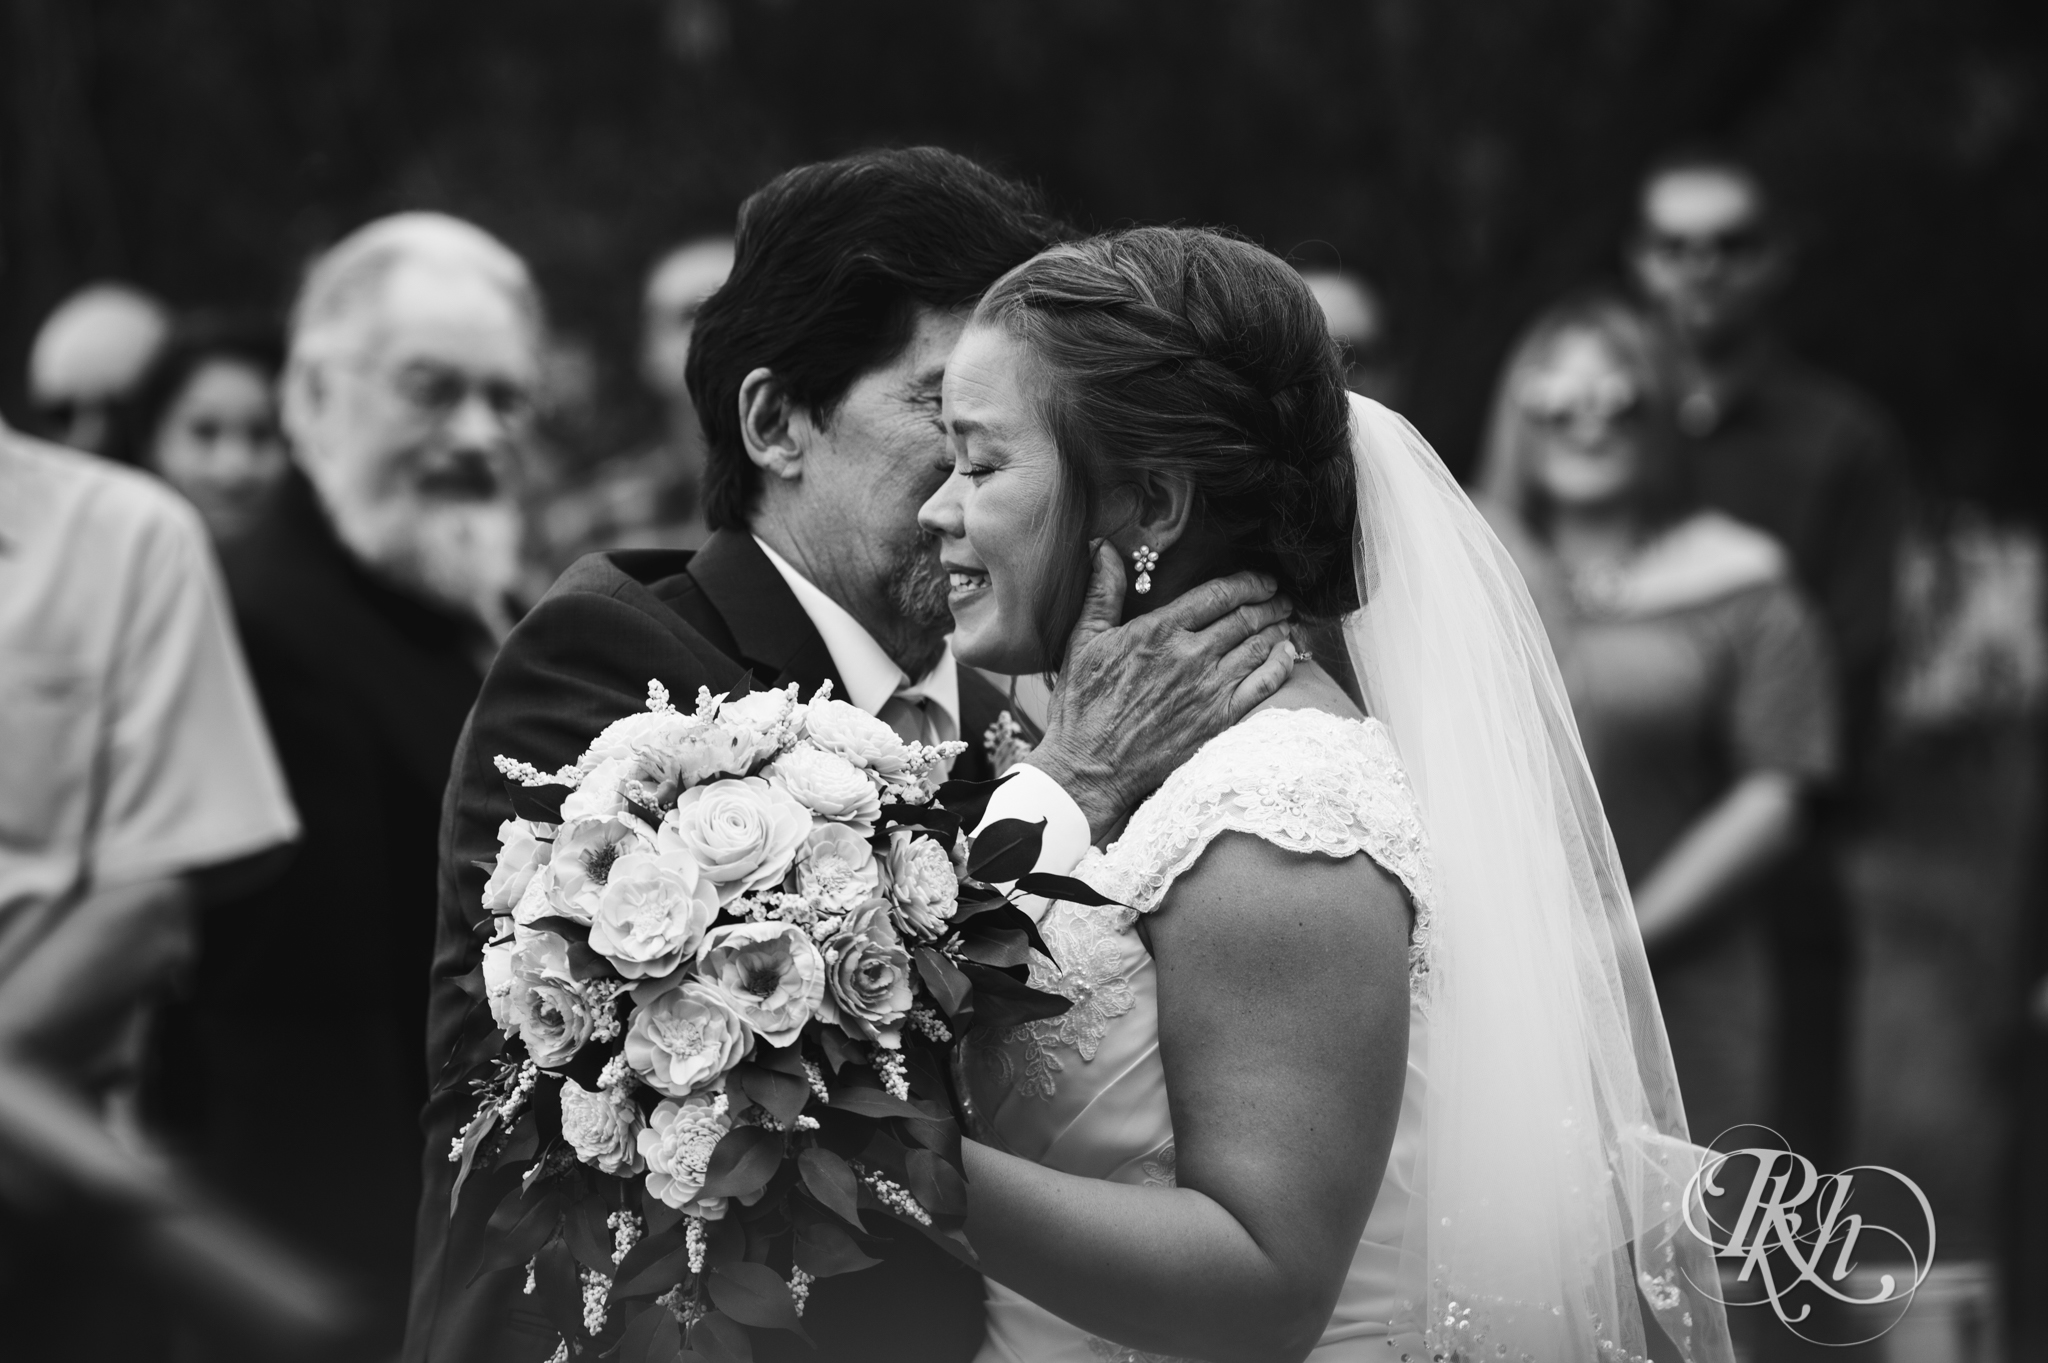 Ally & Nick - Minnesota Wedding Photography - Next Chapter Winery - RKH Images - Blog (17 of 57).jpg